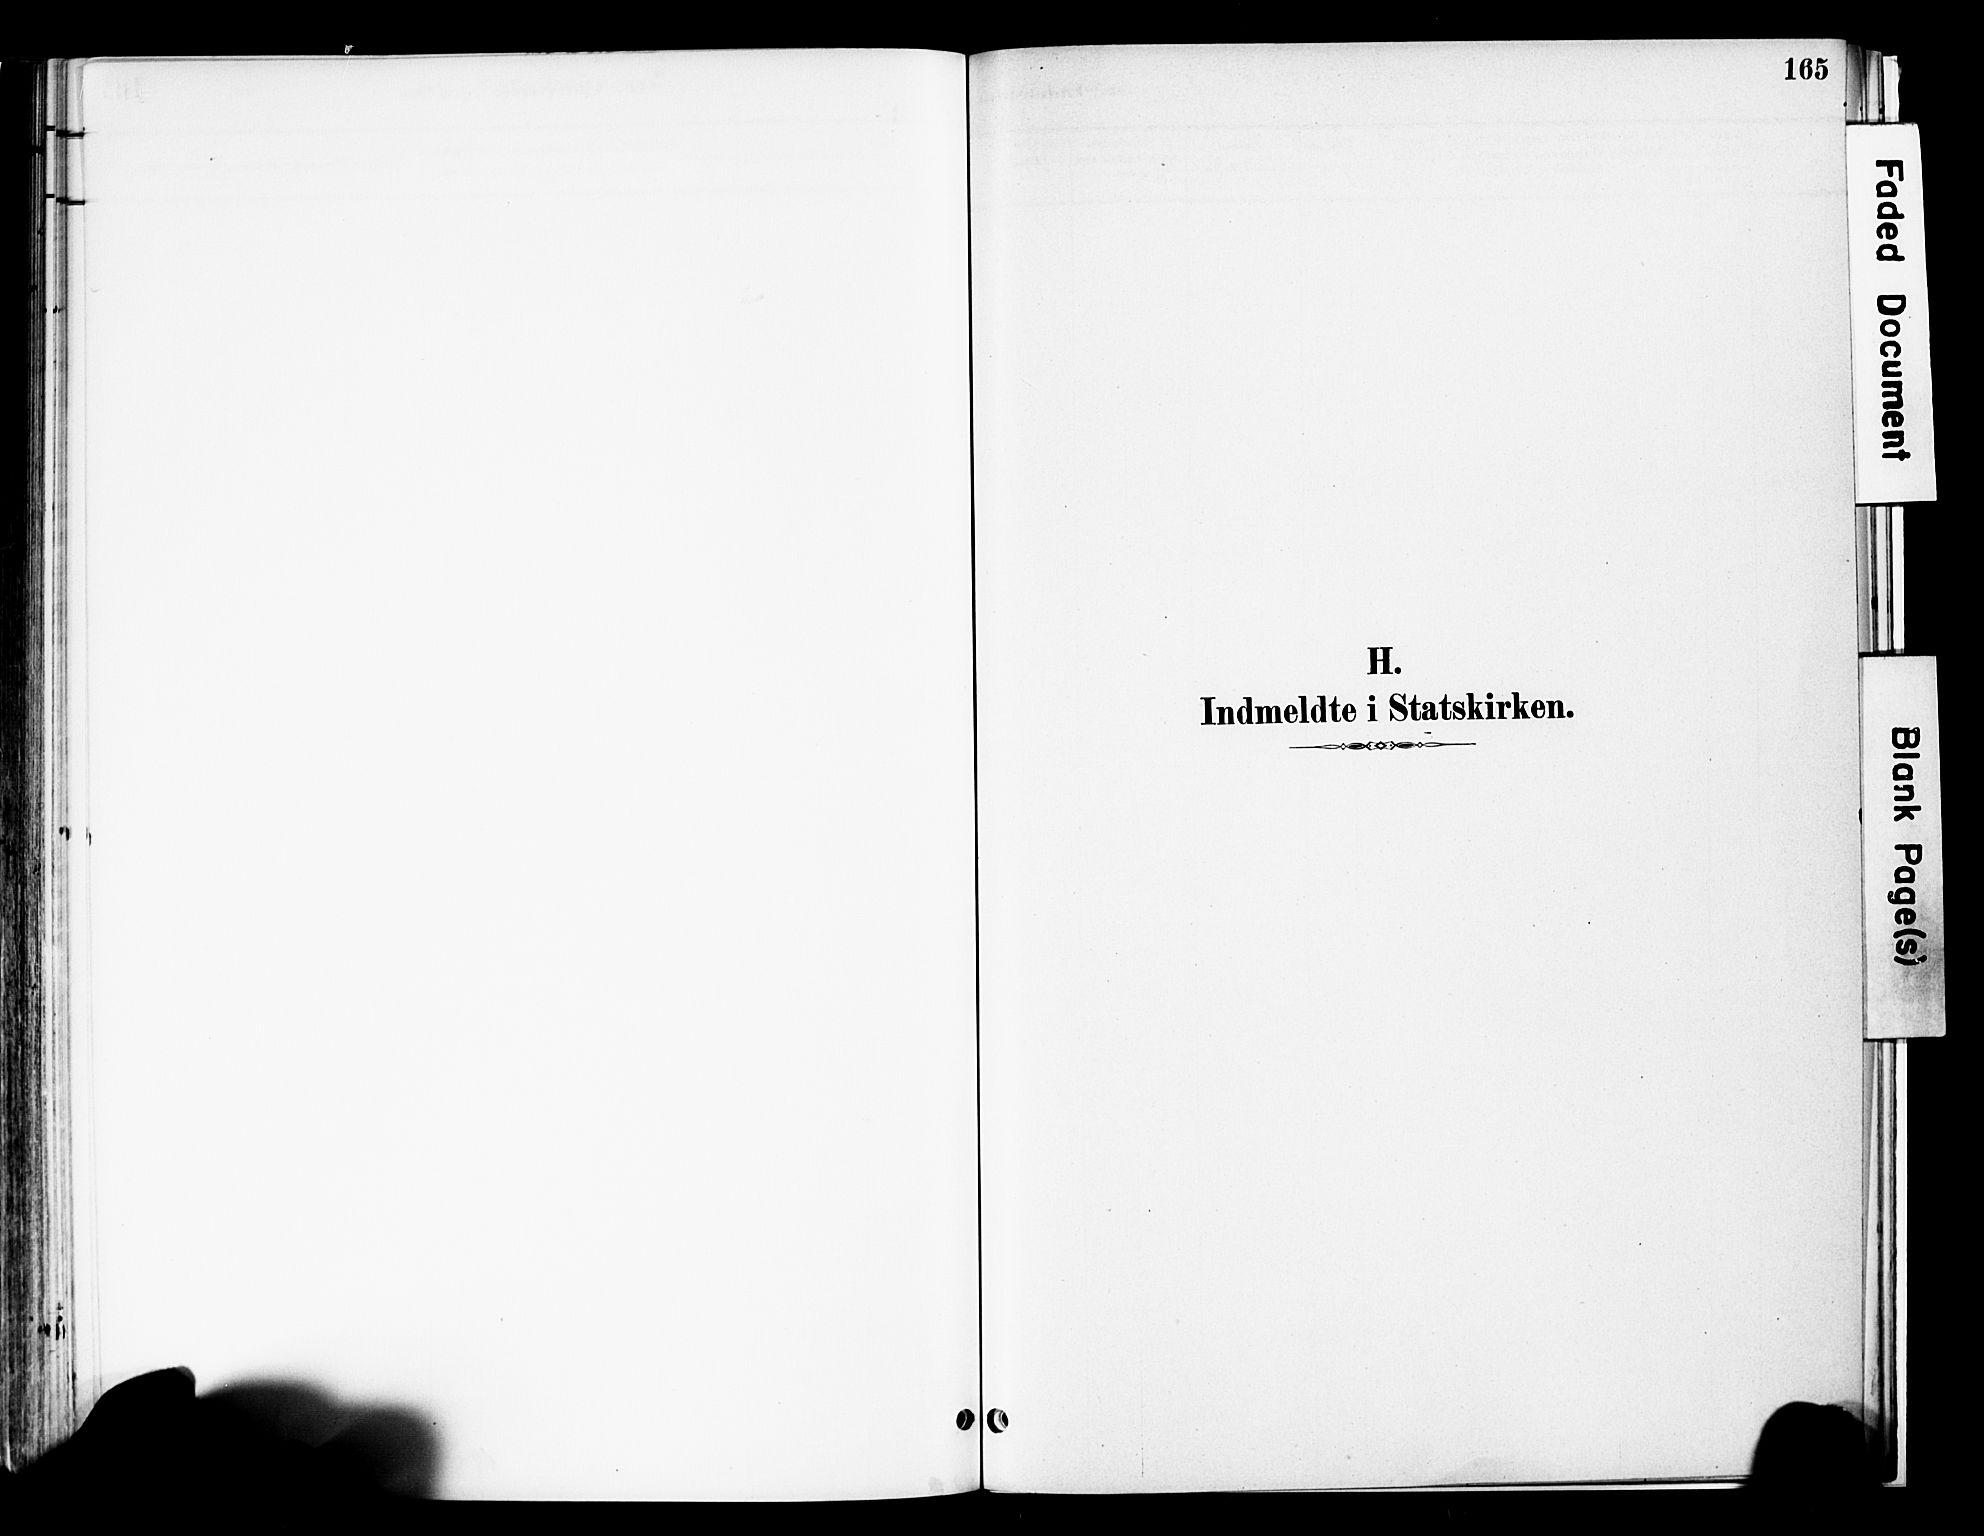 SAH, Vestre Slidre prestekontor, Ministerialbok nr. 6, 1881-1912, s. 165